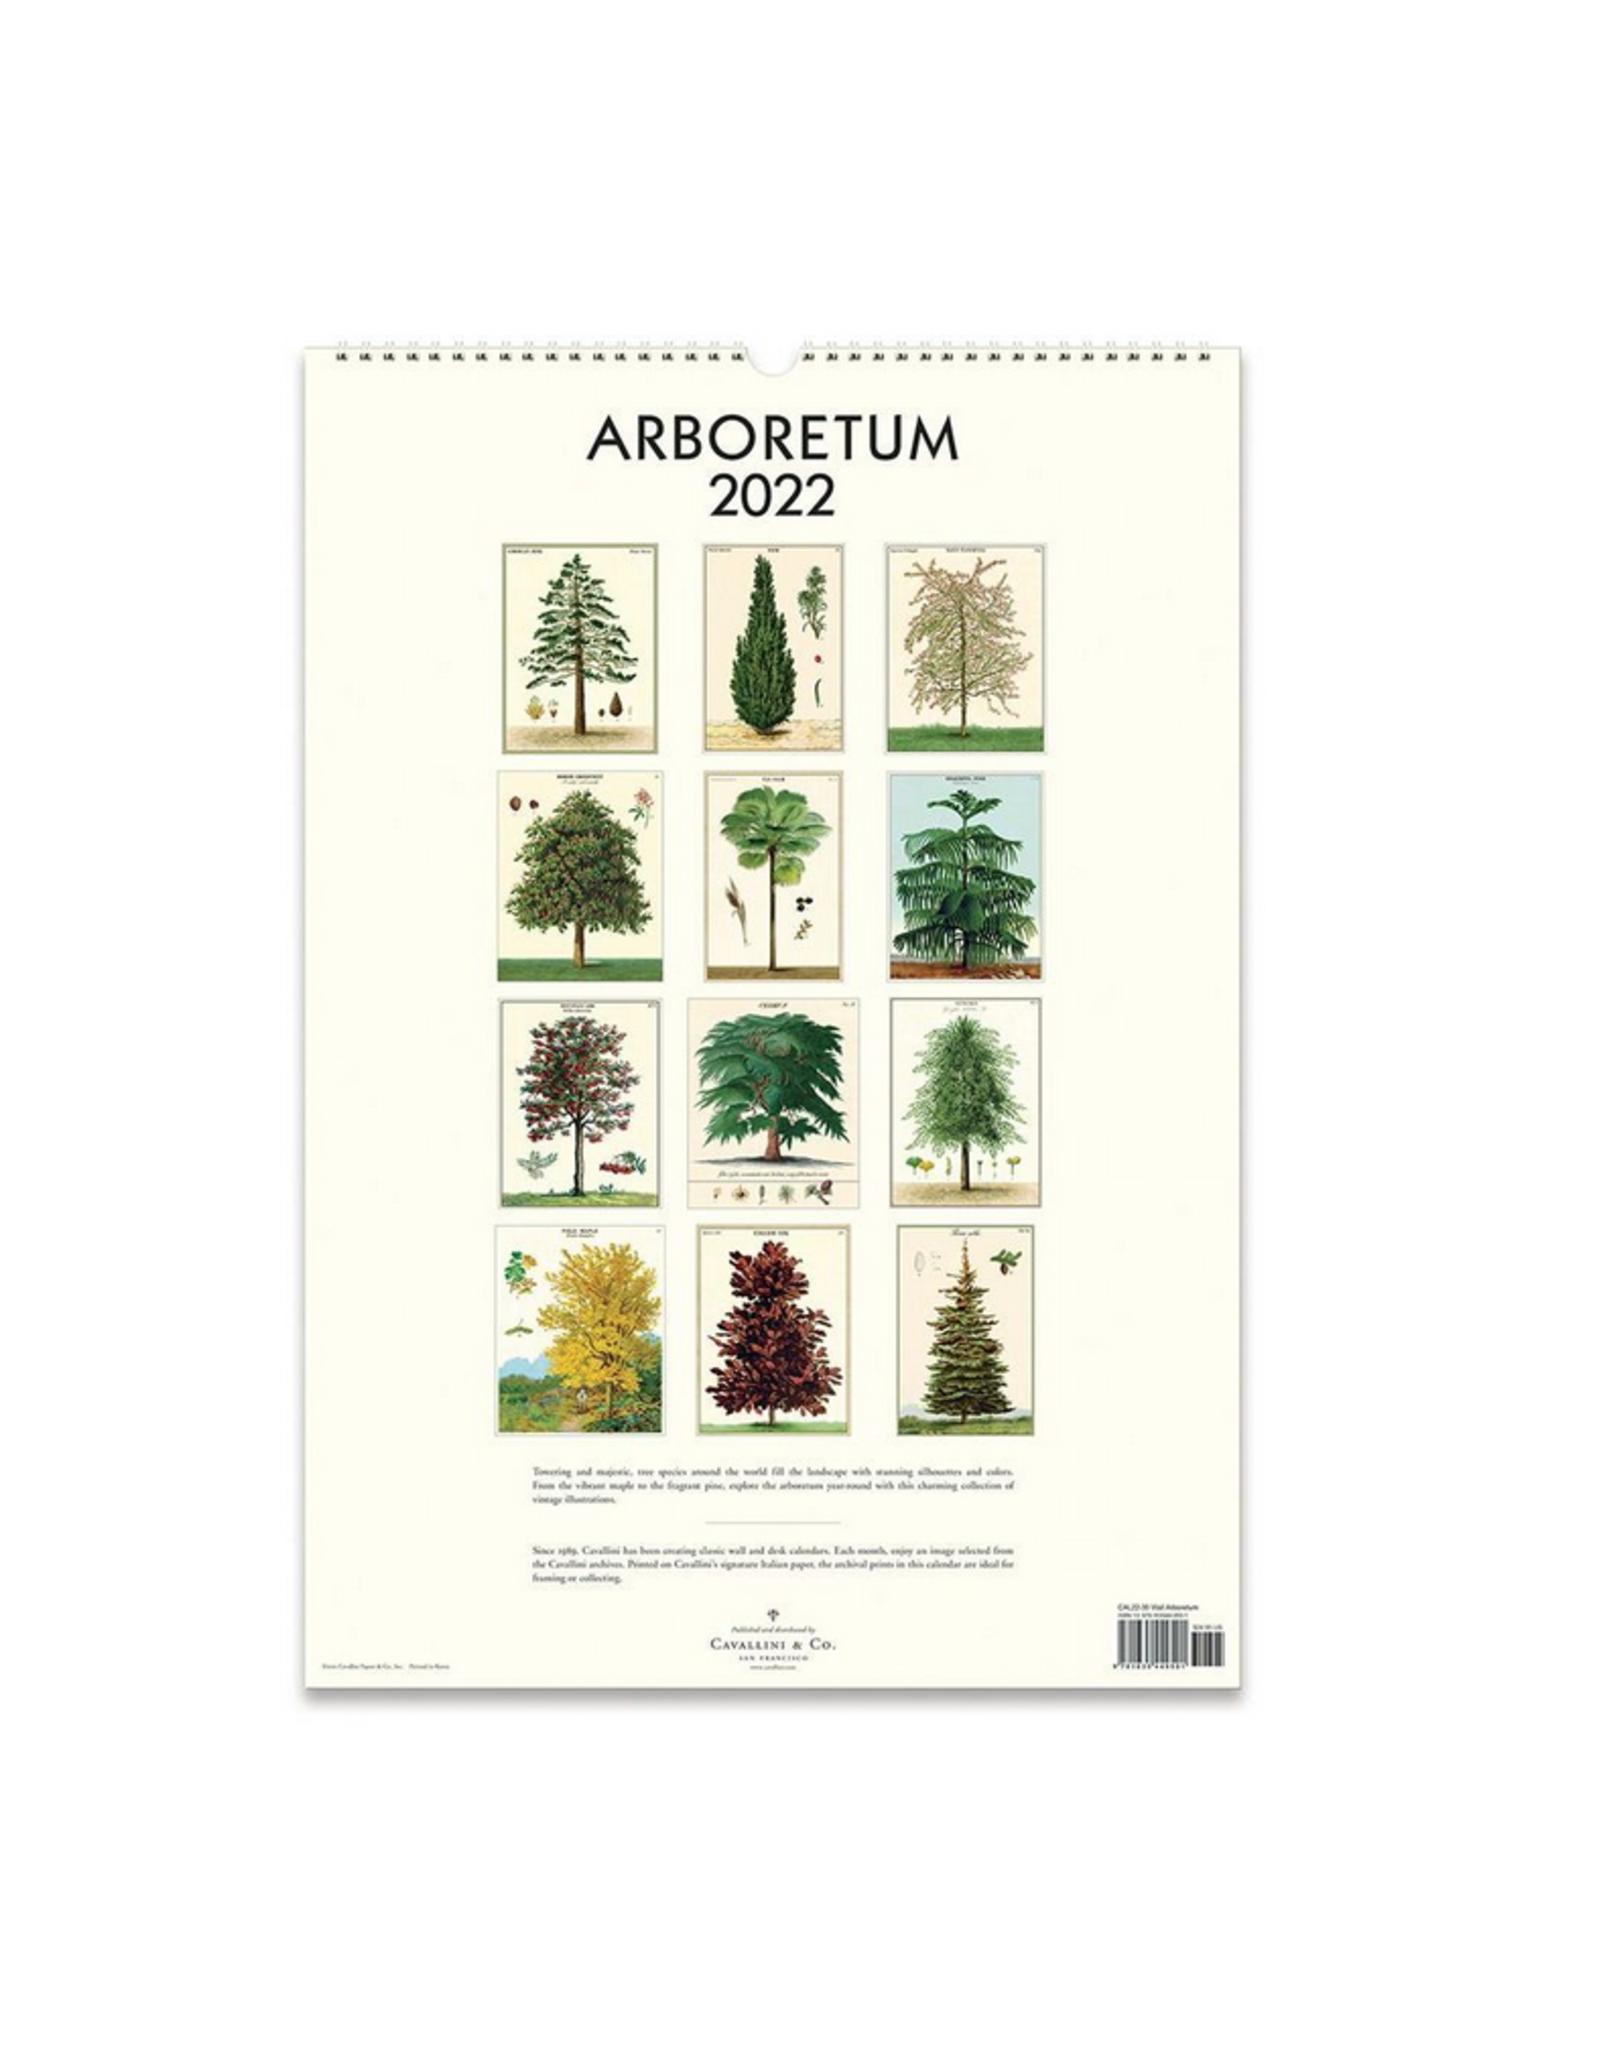 2022 Wall Calendar : Arboretum